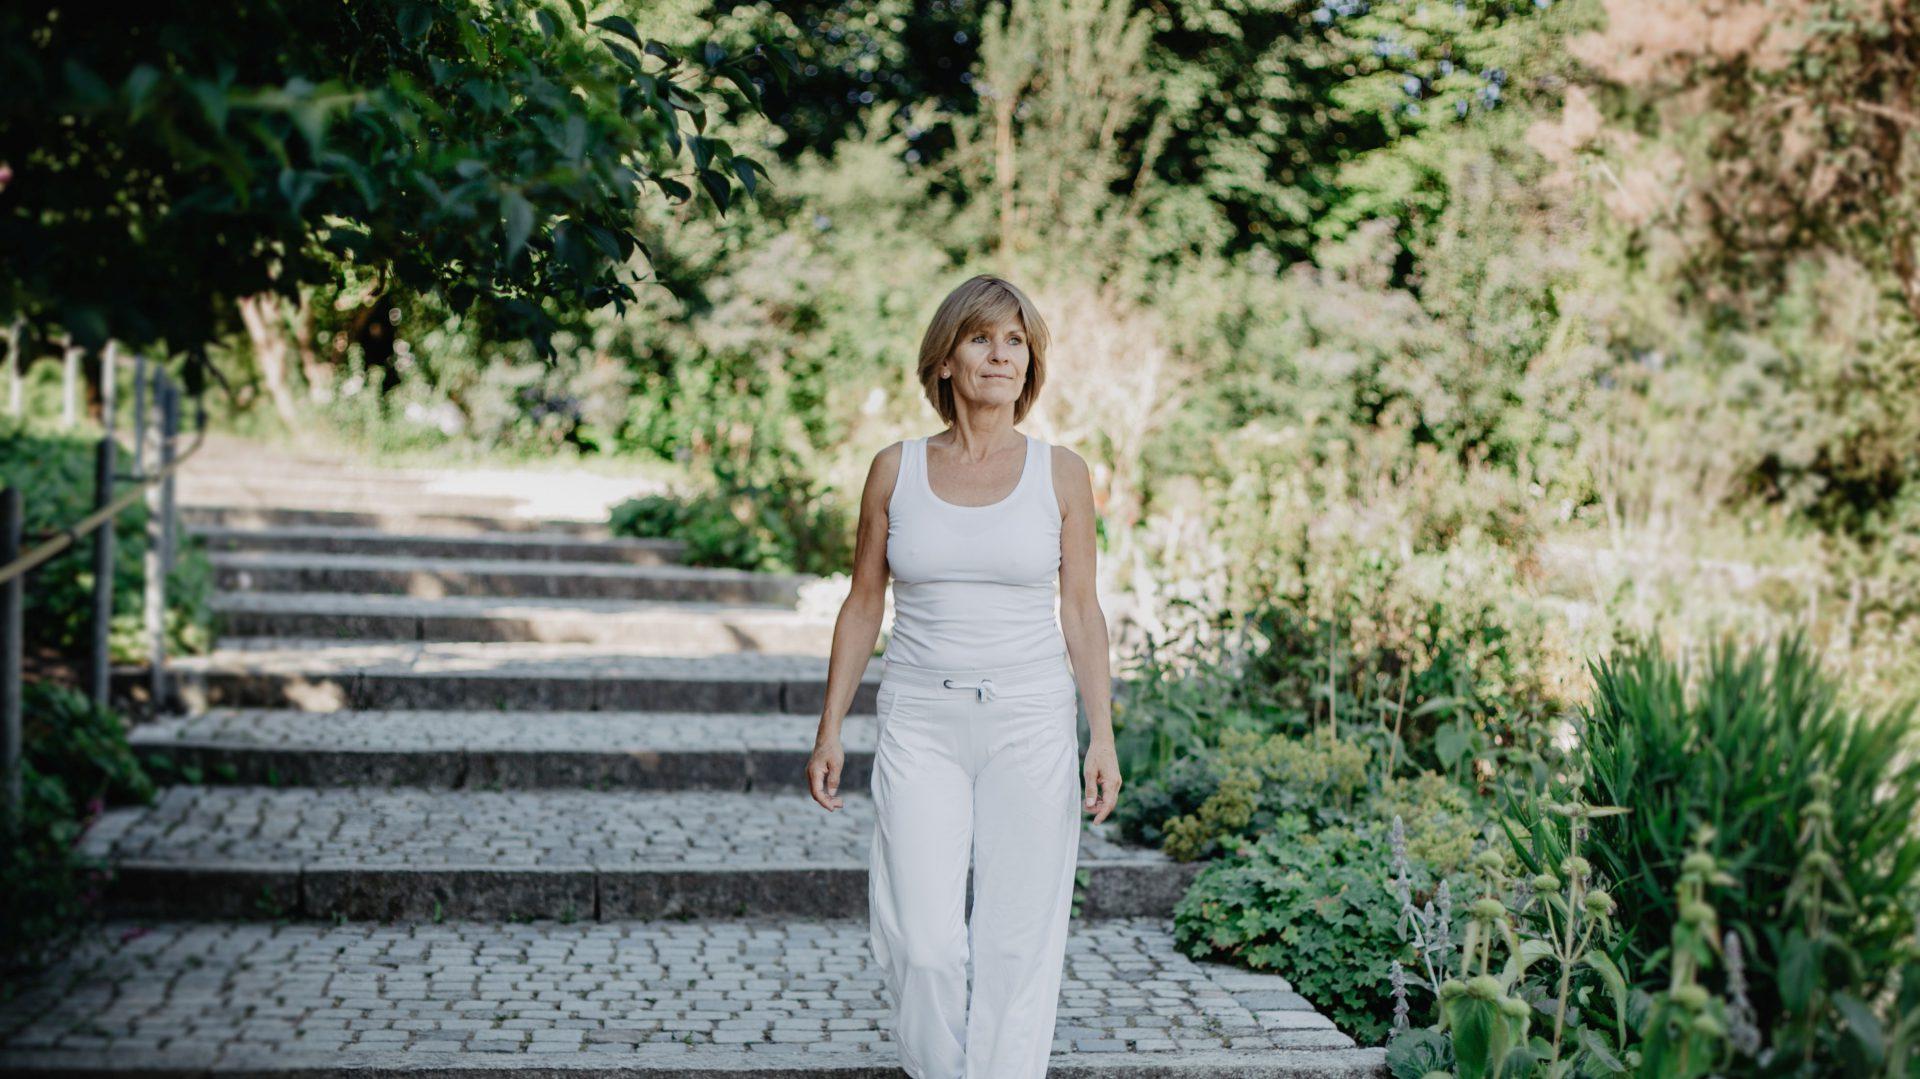 Gabi Kreusch Yoga